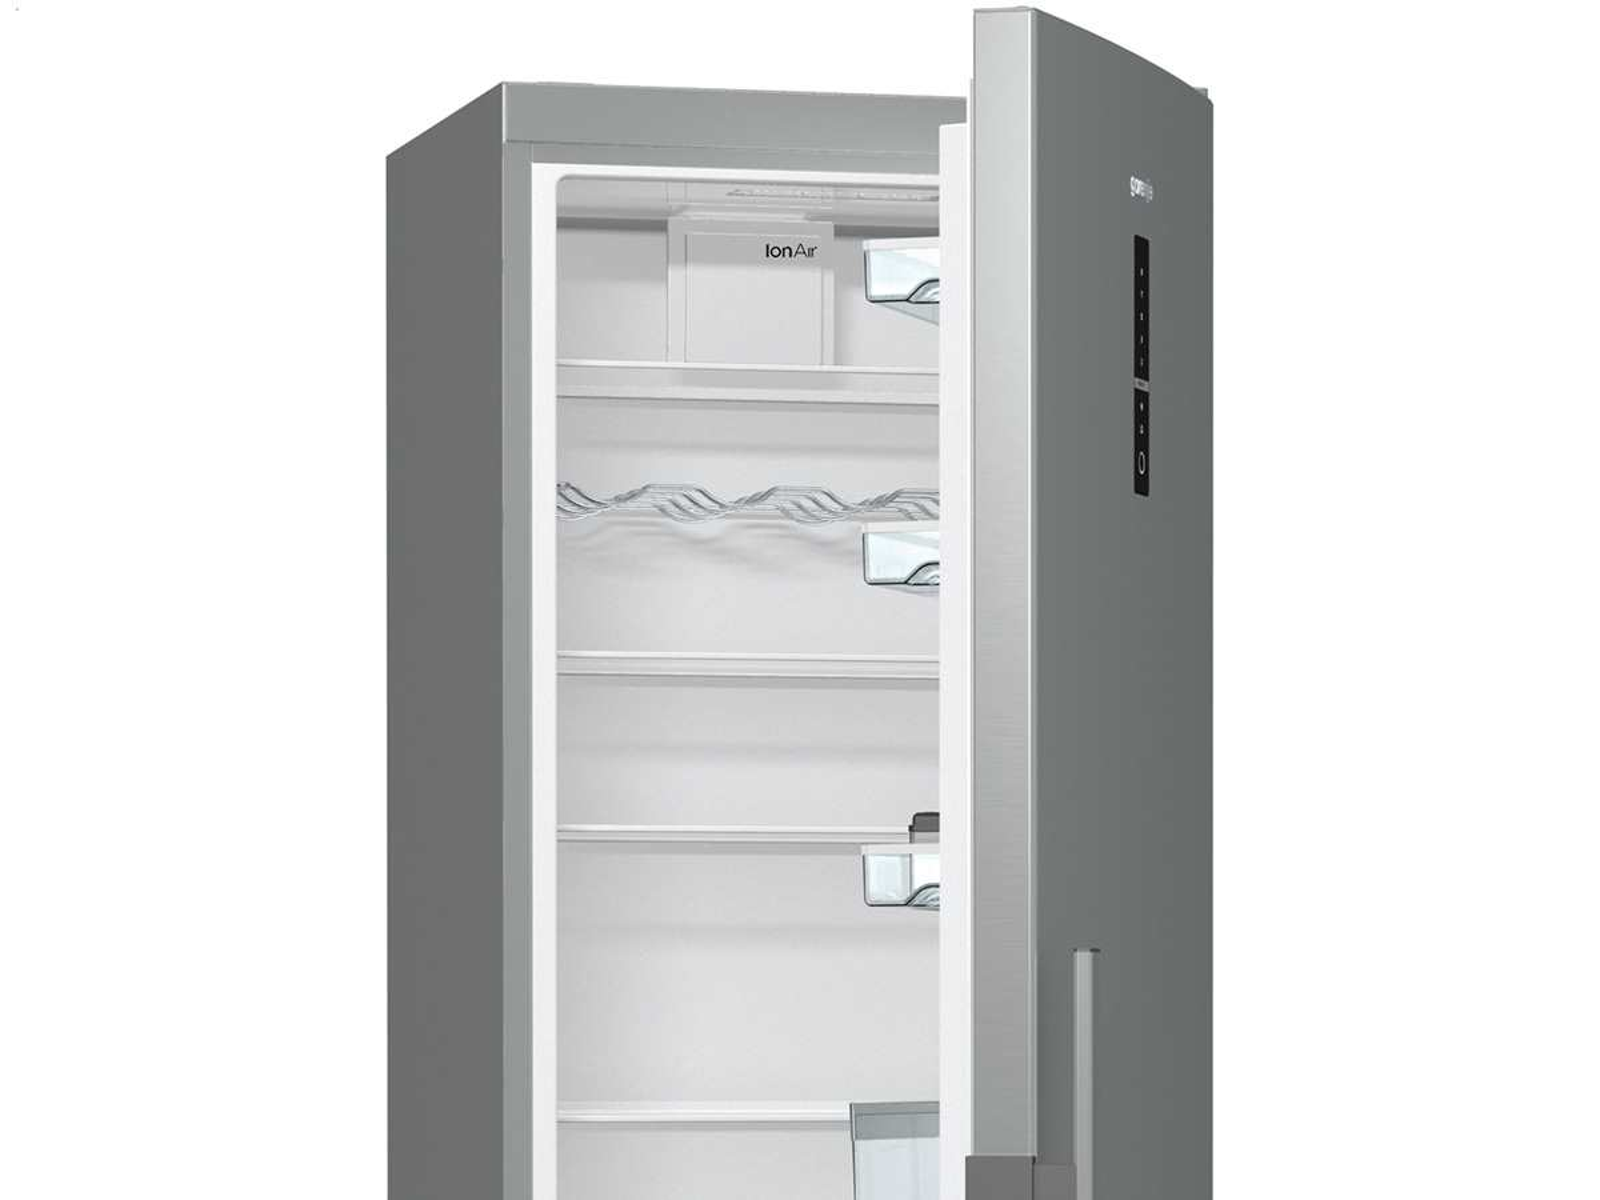 Gorenje Kühlschrank Qualität : Gorenje kühlschrank qualität einbau kühlschrank integrierbar rbi